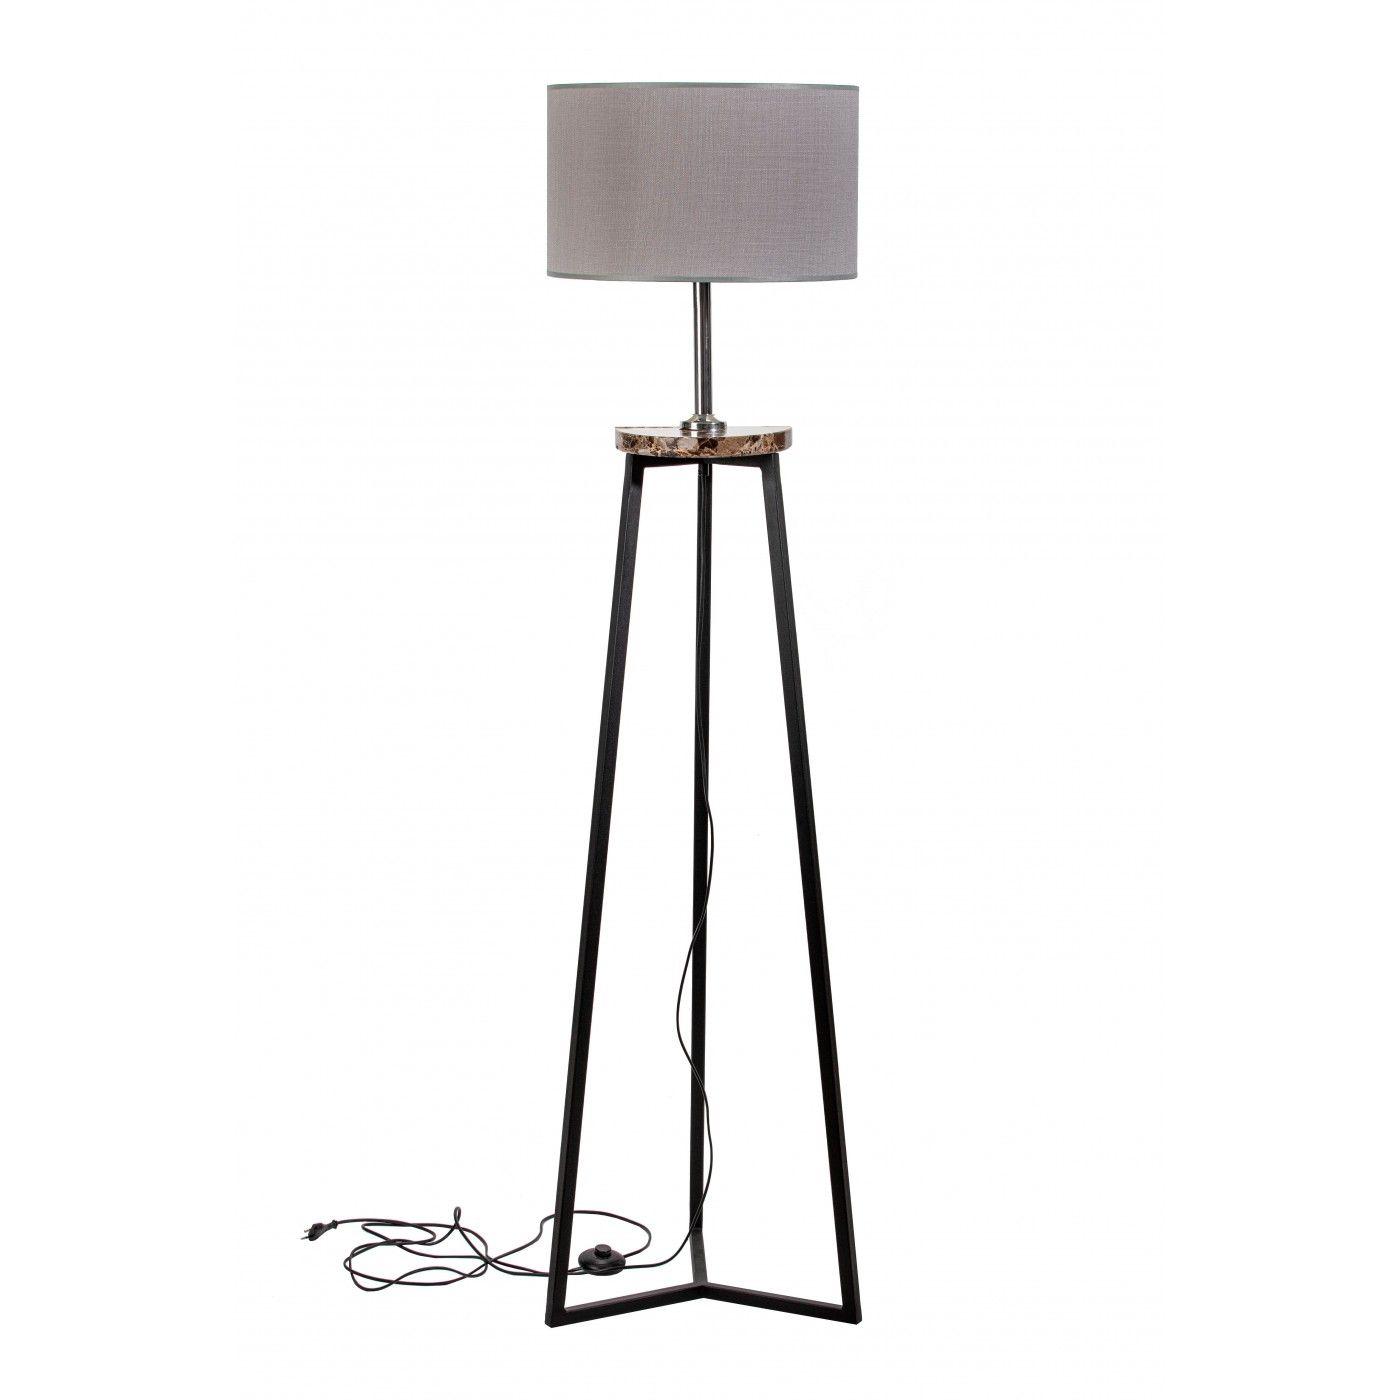 Loft Lampa Podlogowa Floki Szary Marmur 167x42 Cm Tb395 Tripod Lamp Lamp Home Decor